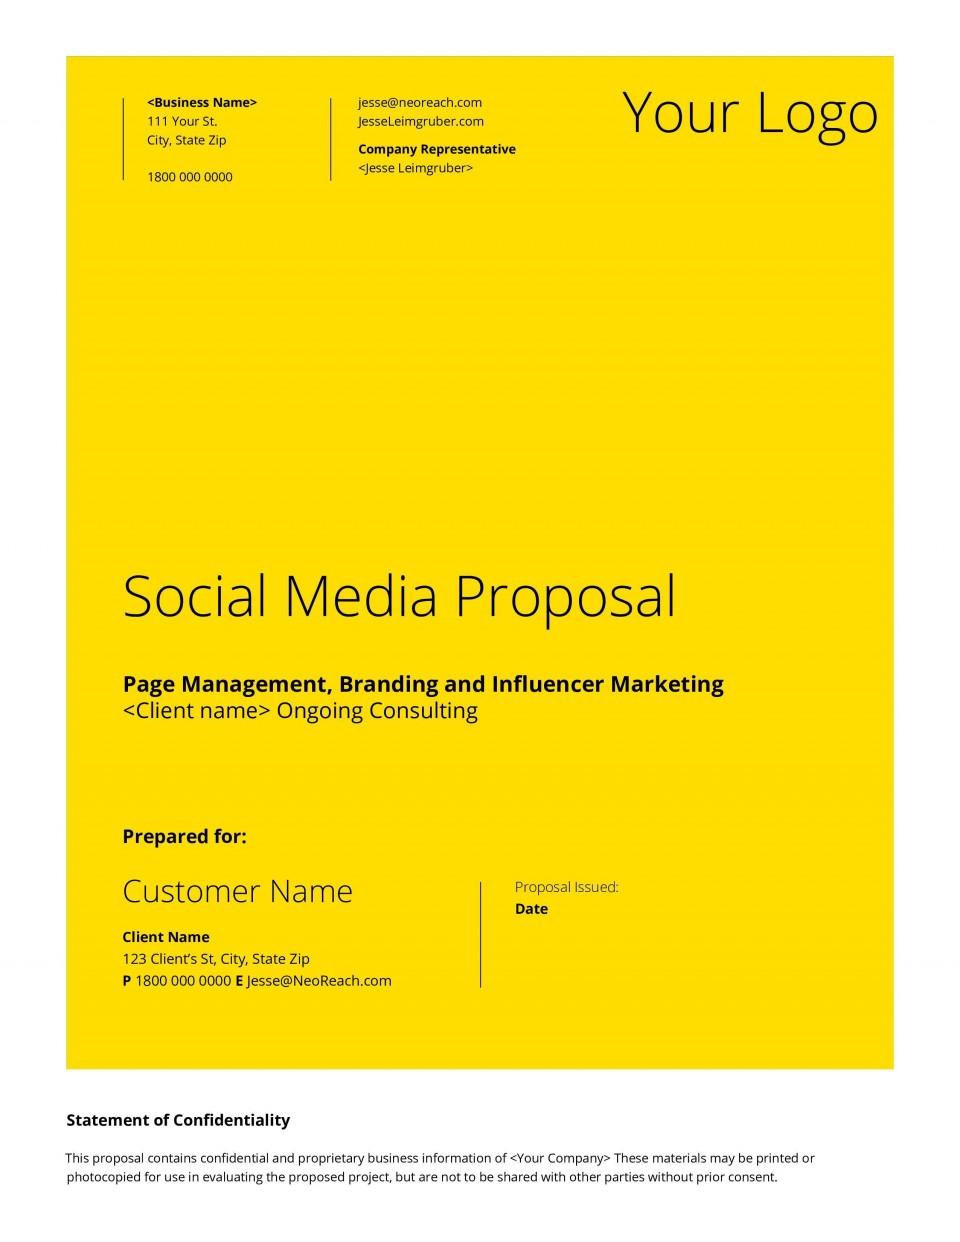 008 Frightening Social Media Proposal Template 2019 Inspiration 960